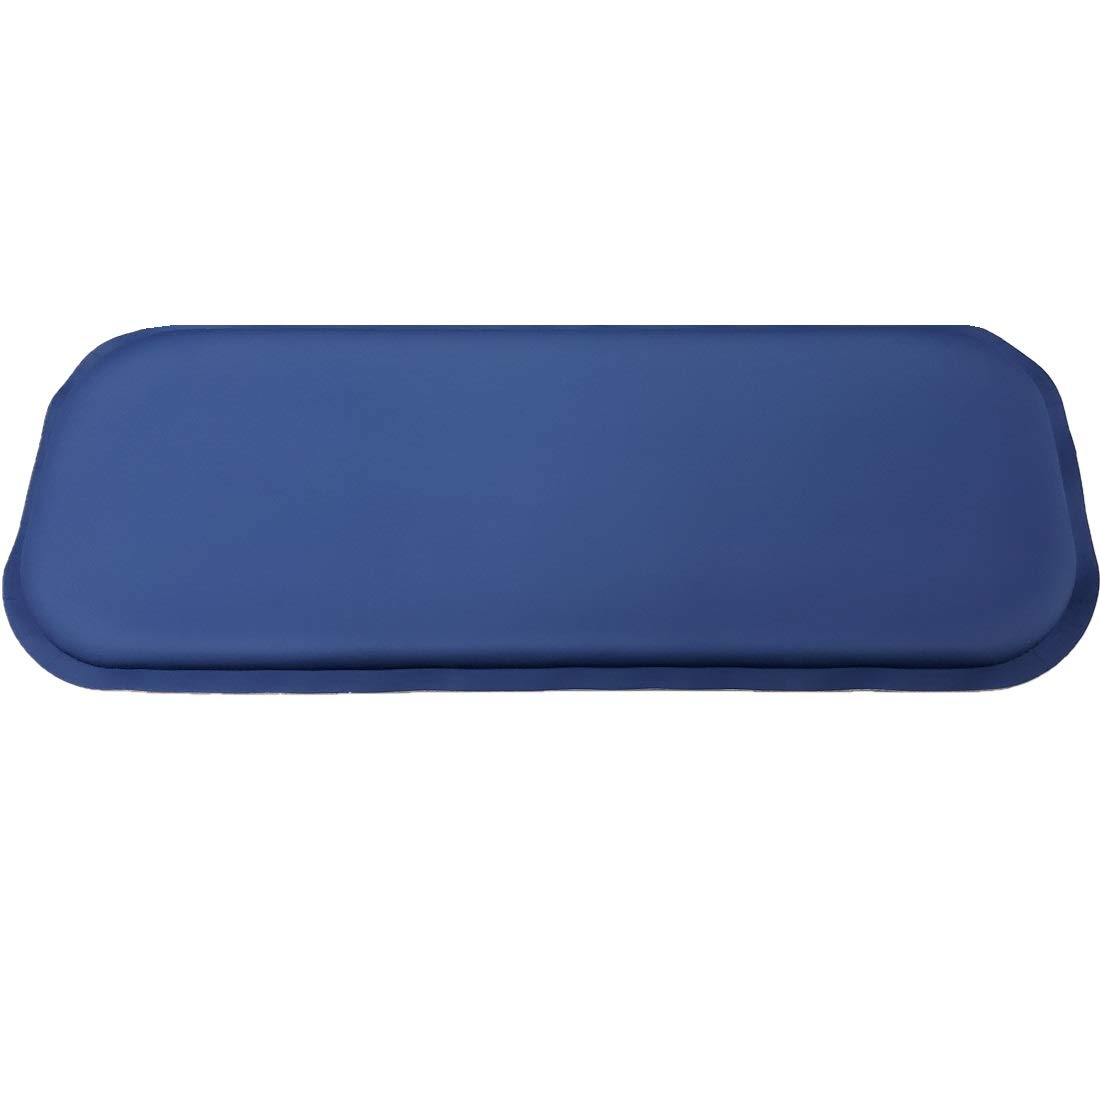 ULTRAGEL ''Gaming Super Comfy Arm/Elbow/Wrist Rest Gel Pad for Keyboards (Slim 5x12.5, Blue)